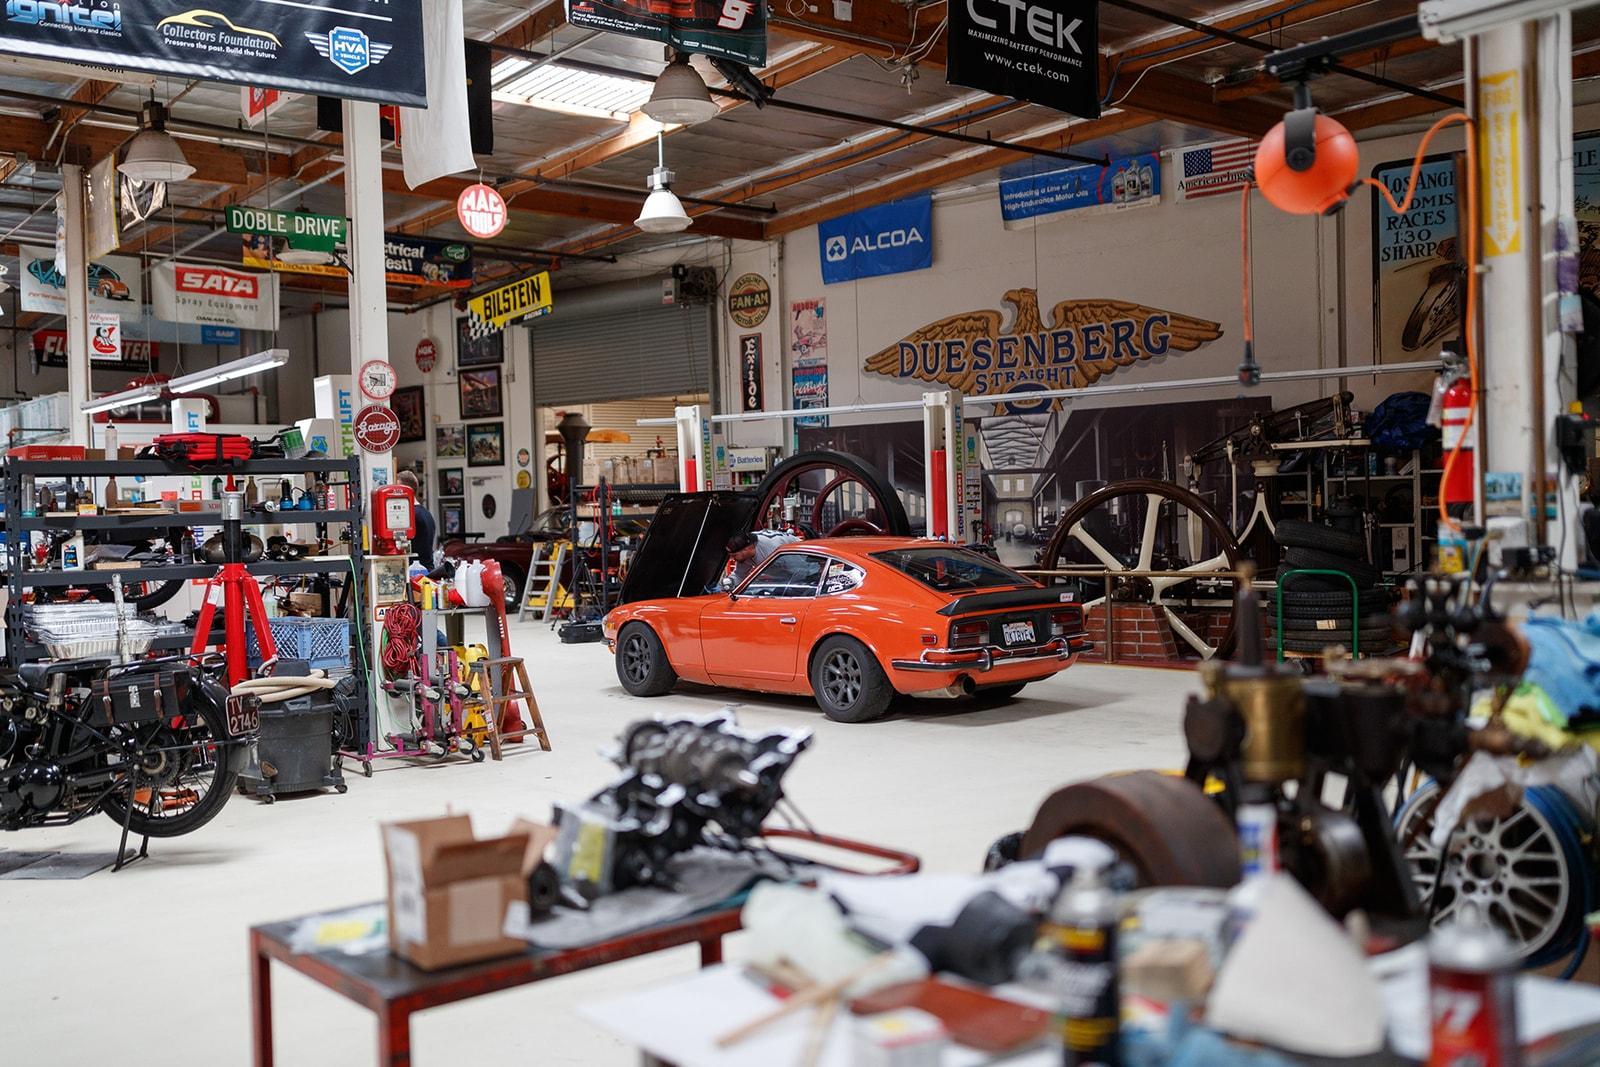 Photographer Larry Chen's Orange 1970 Datsun 240Z Nissan Drift Fast Furious Hoonigan Modified